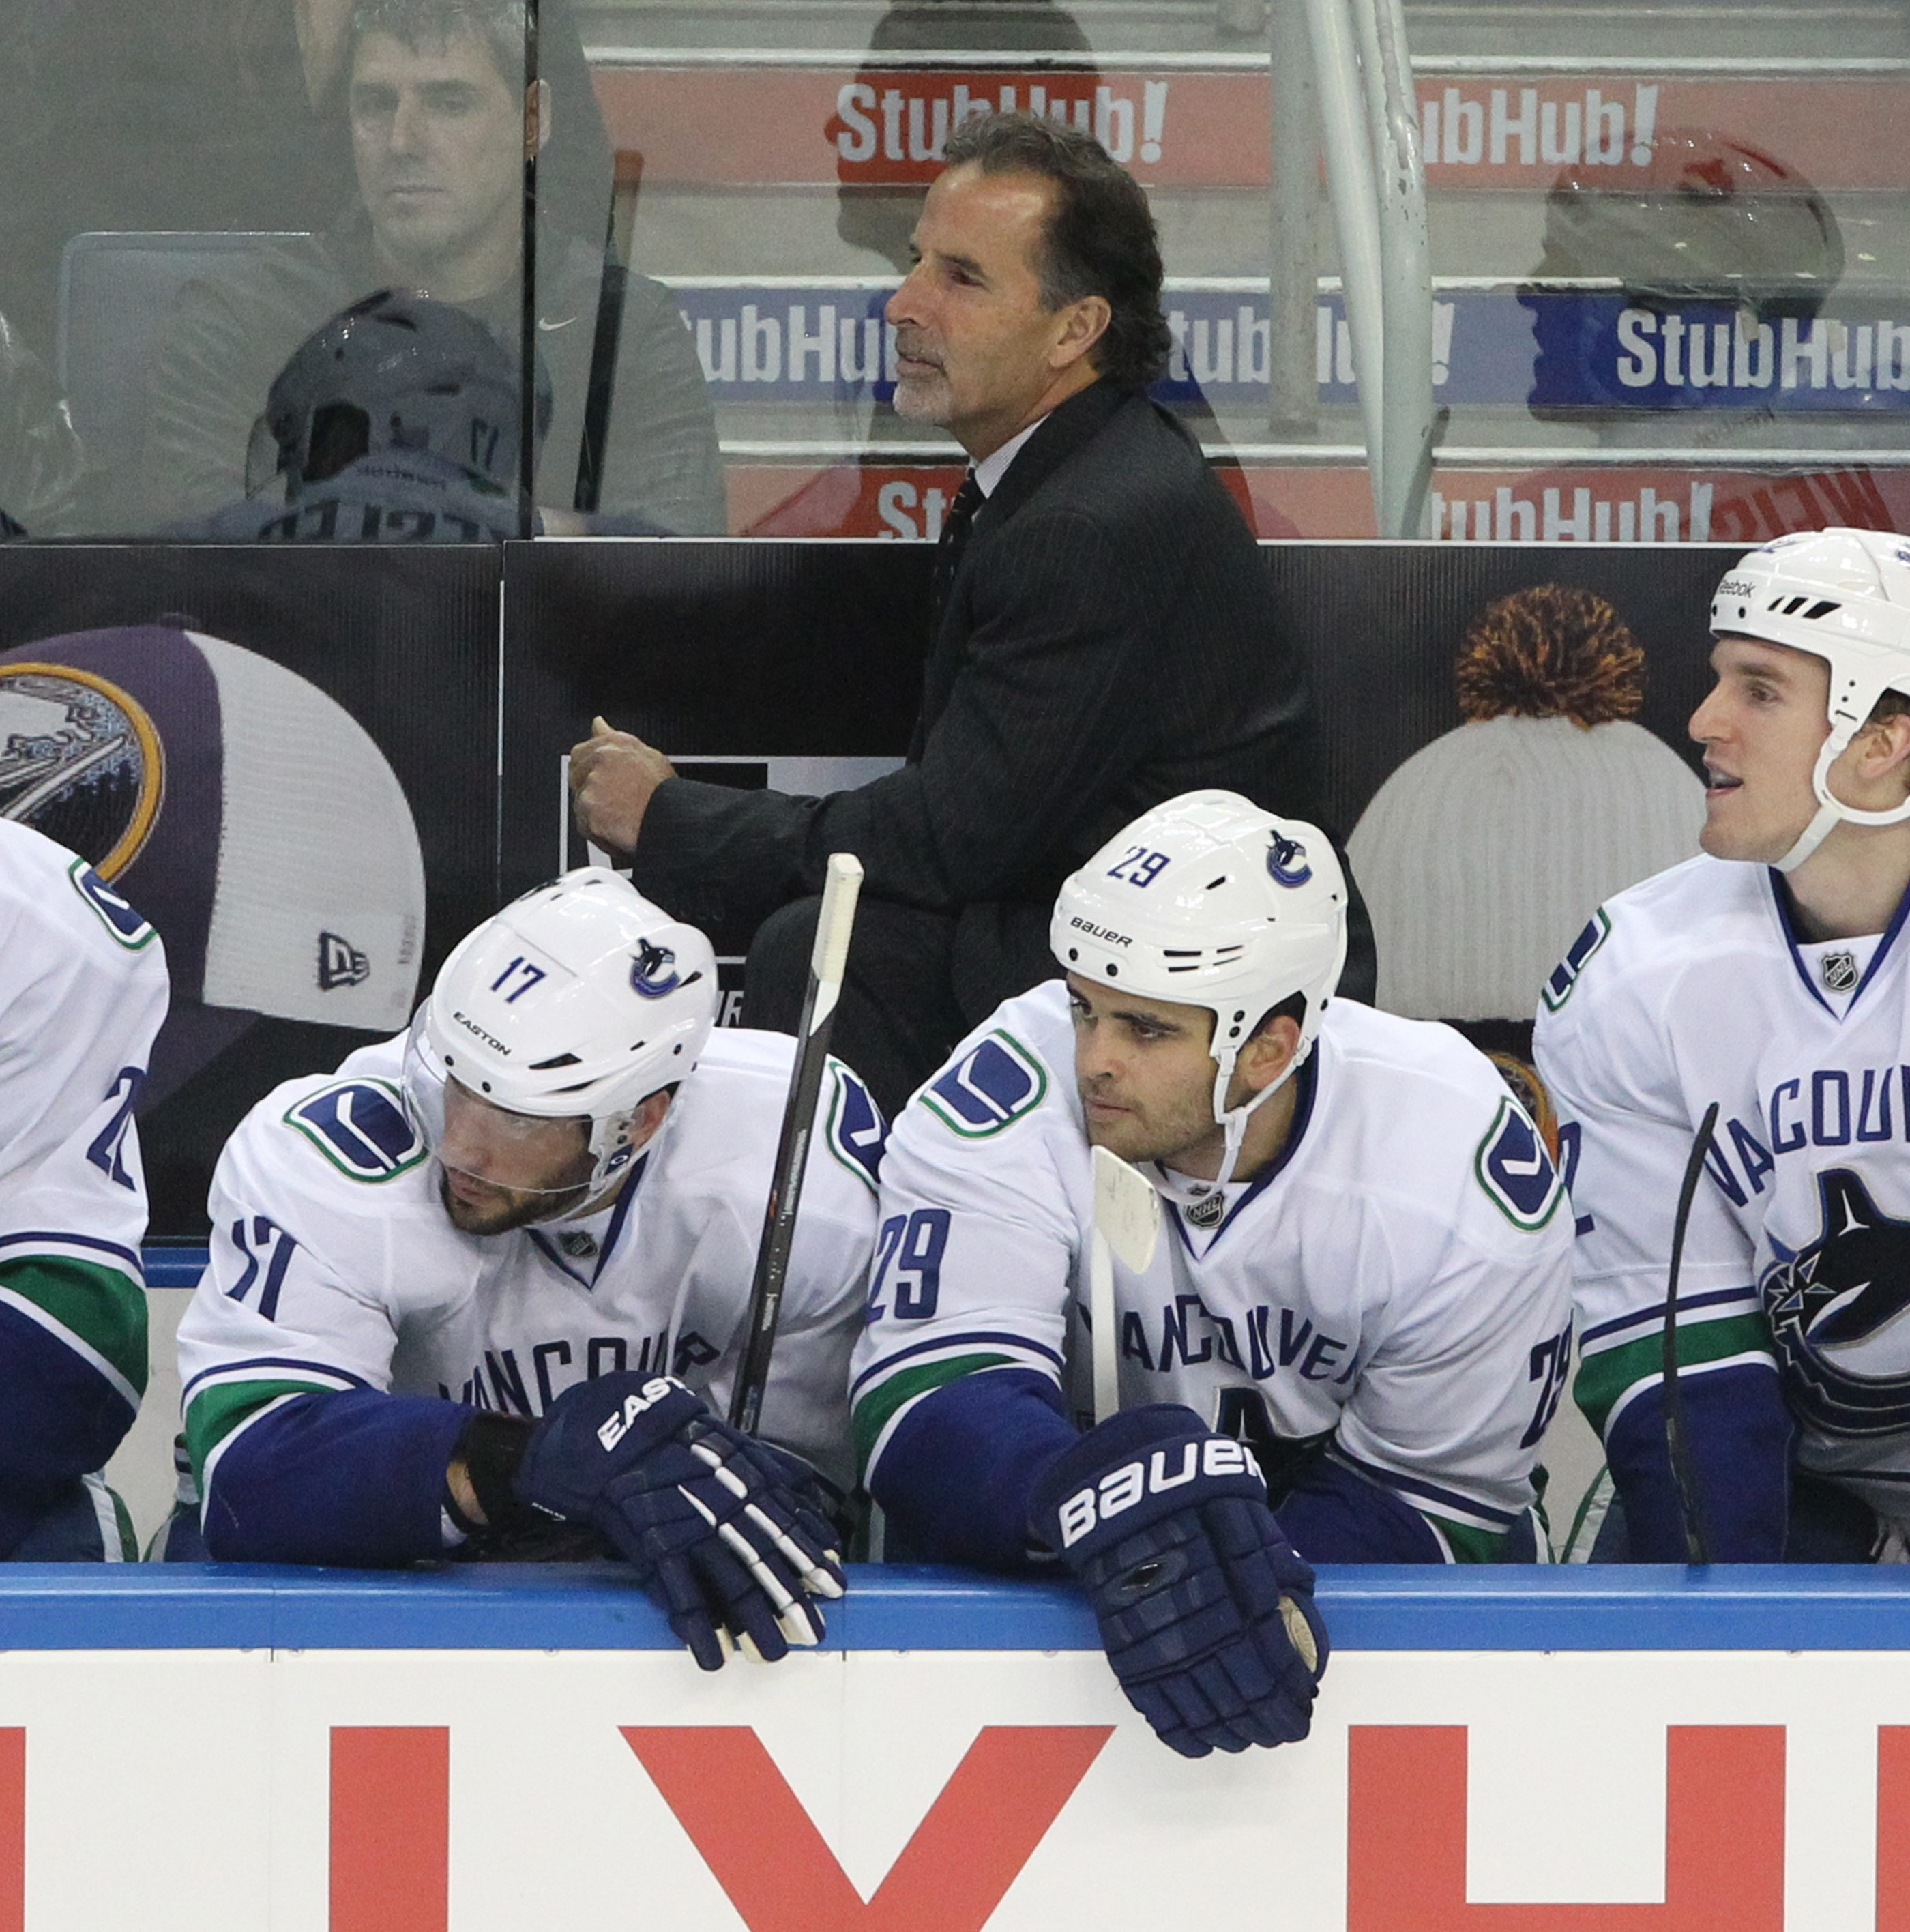 Vancouver Canucks head coach John Tortorella recalled his time spent coaching in Buffalo fondly.